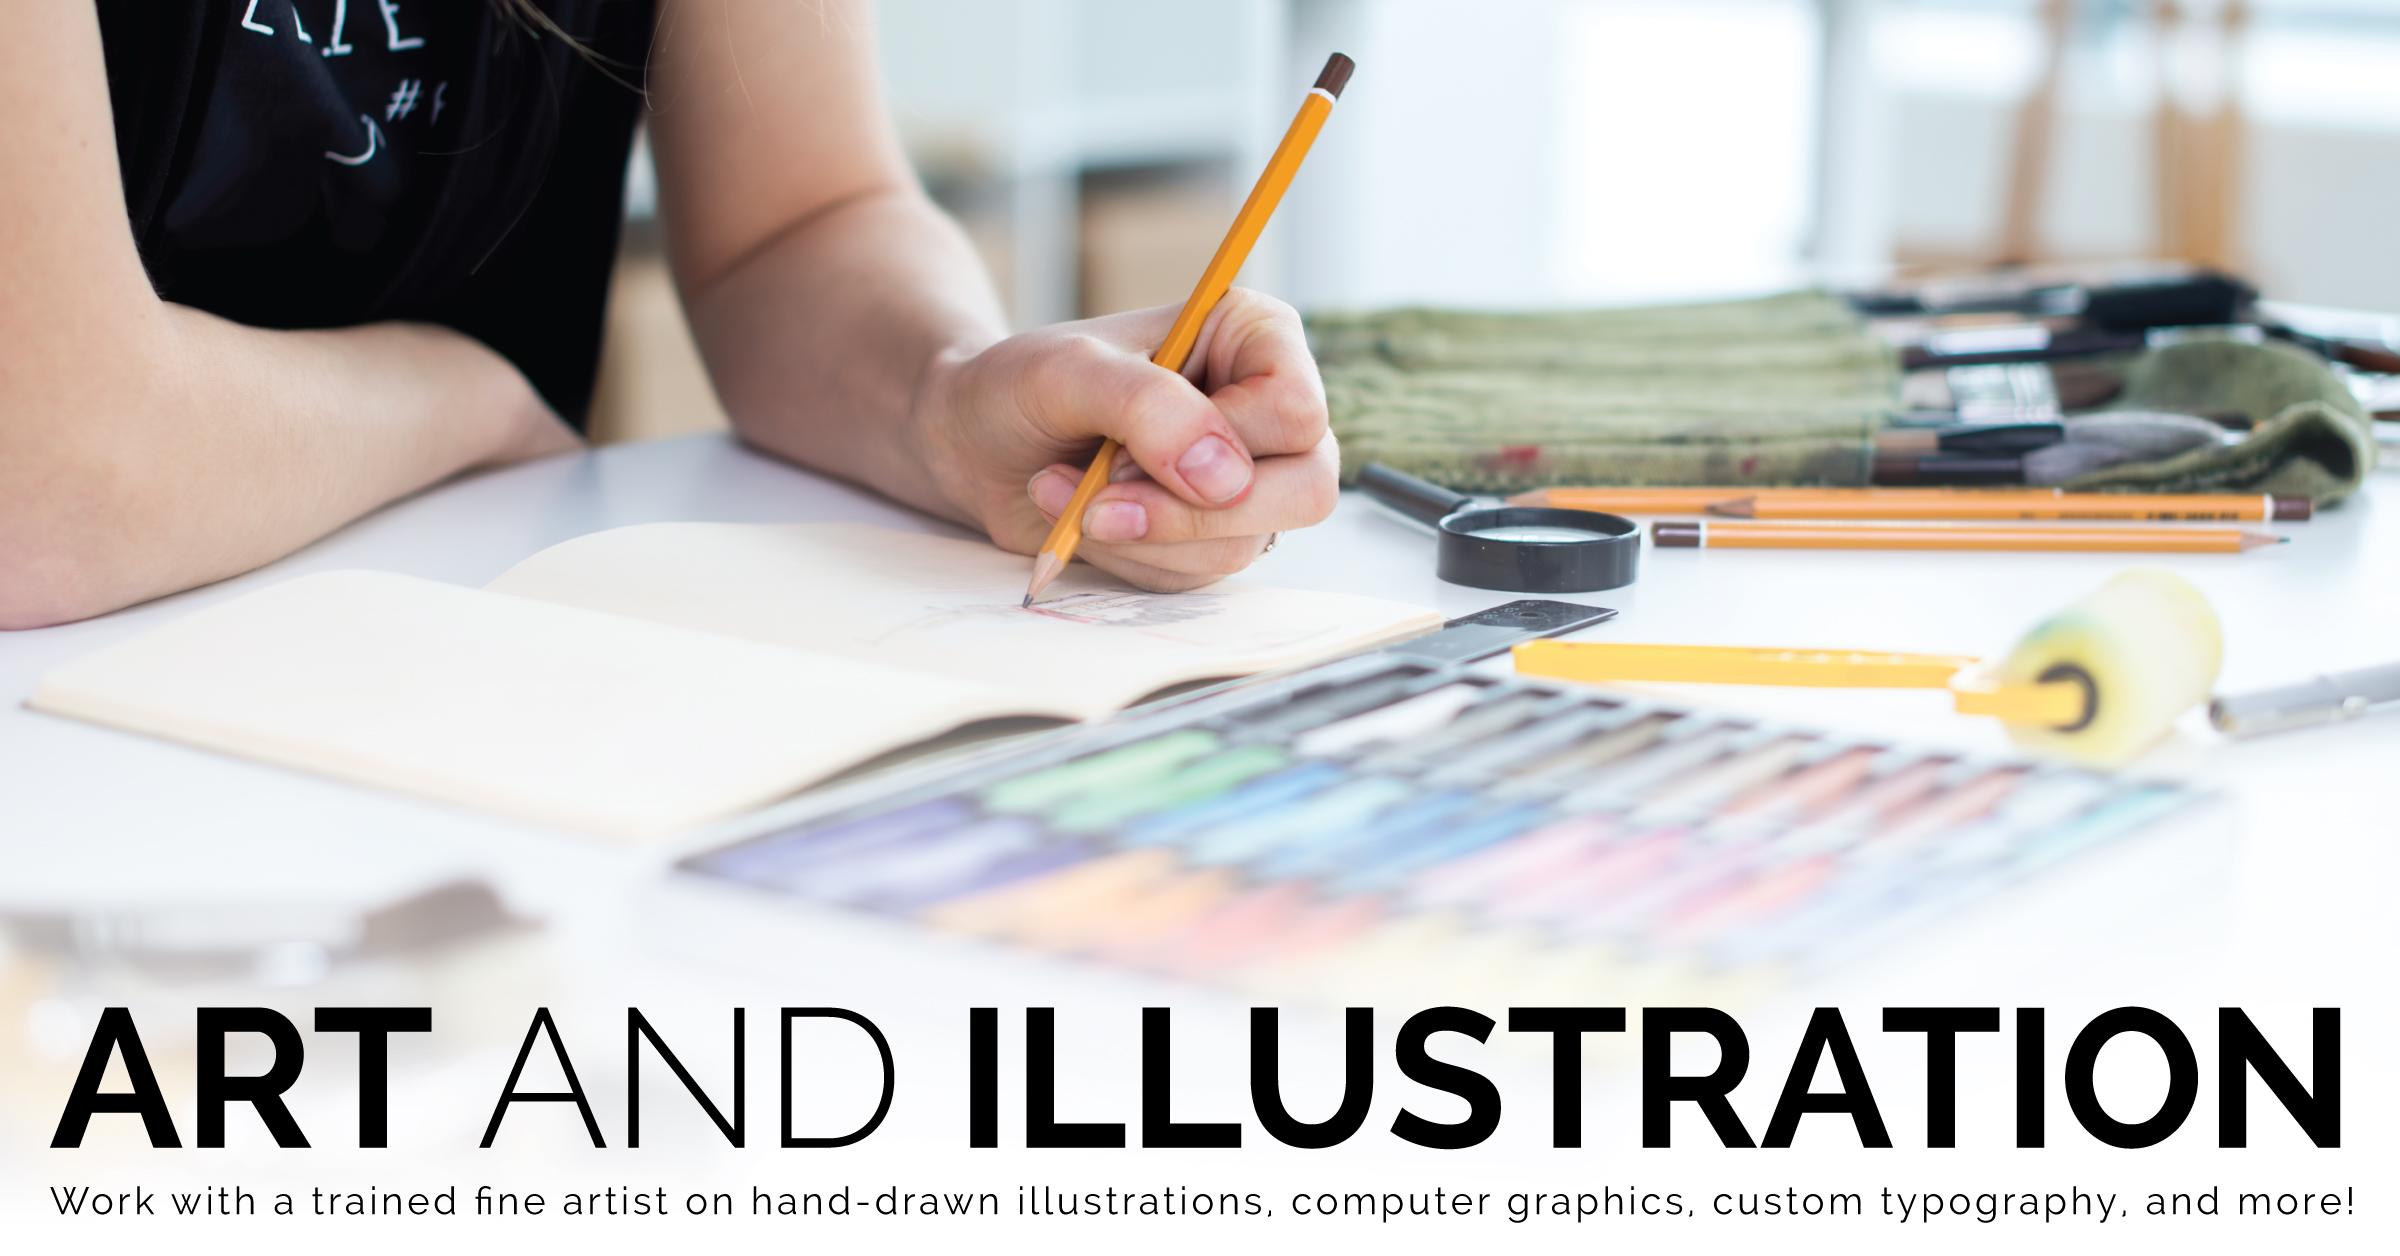 Art and Illustration